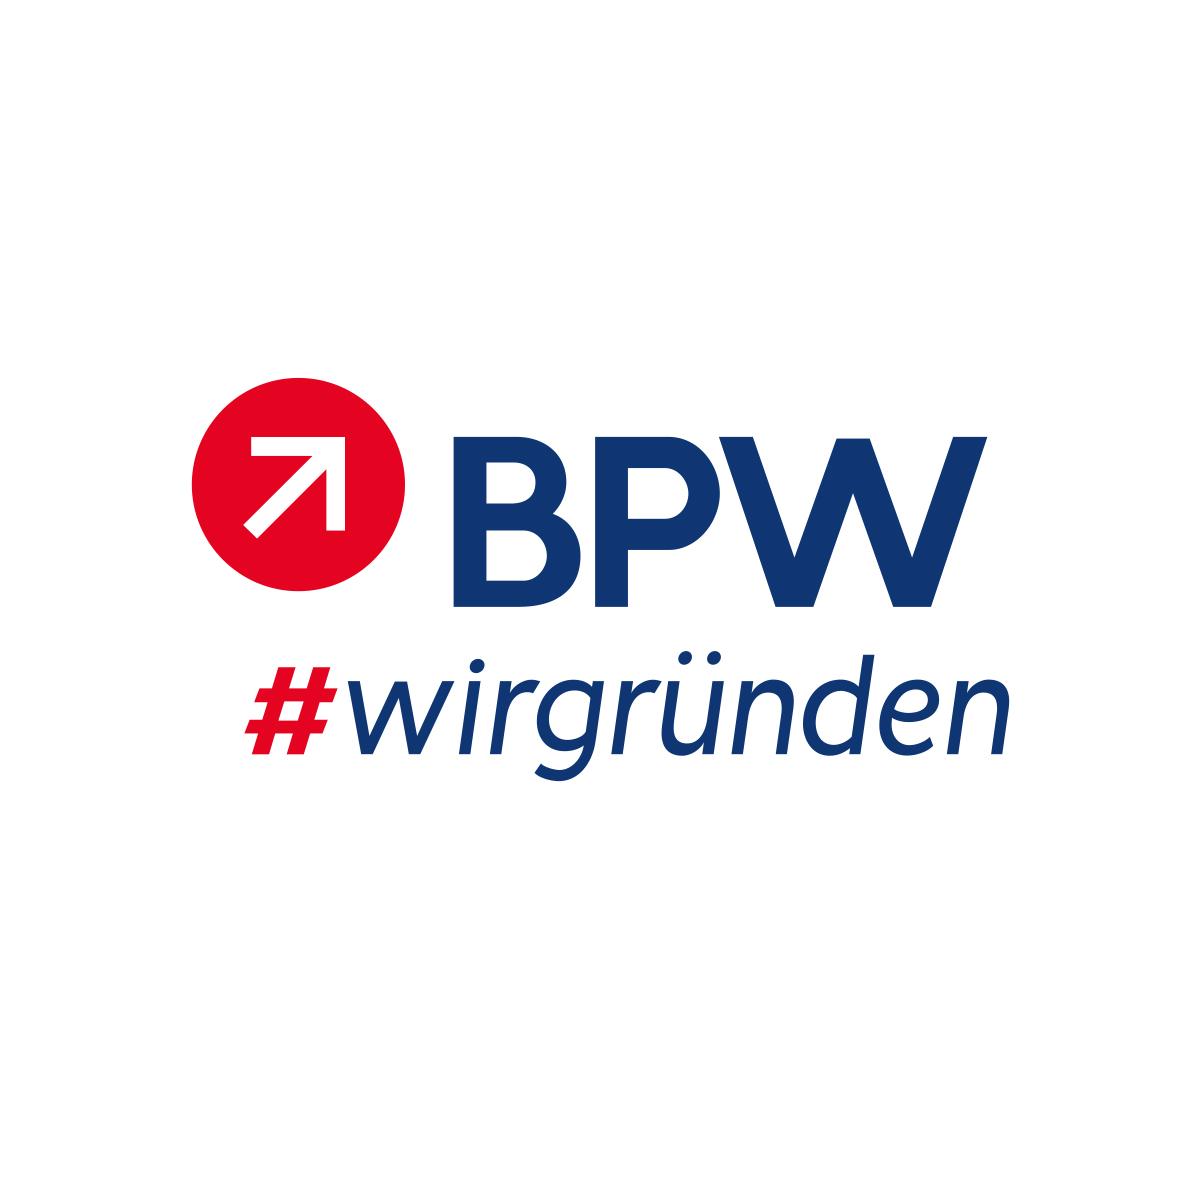 Profilbild_BPW_2019.jpg